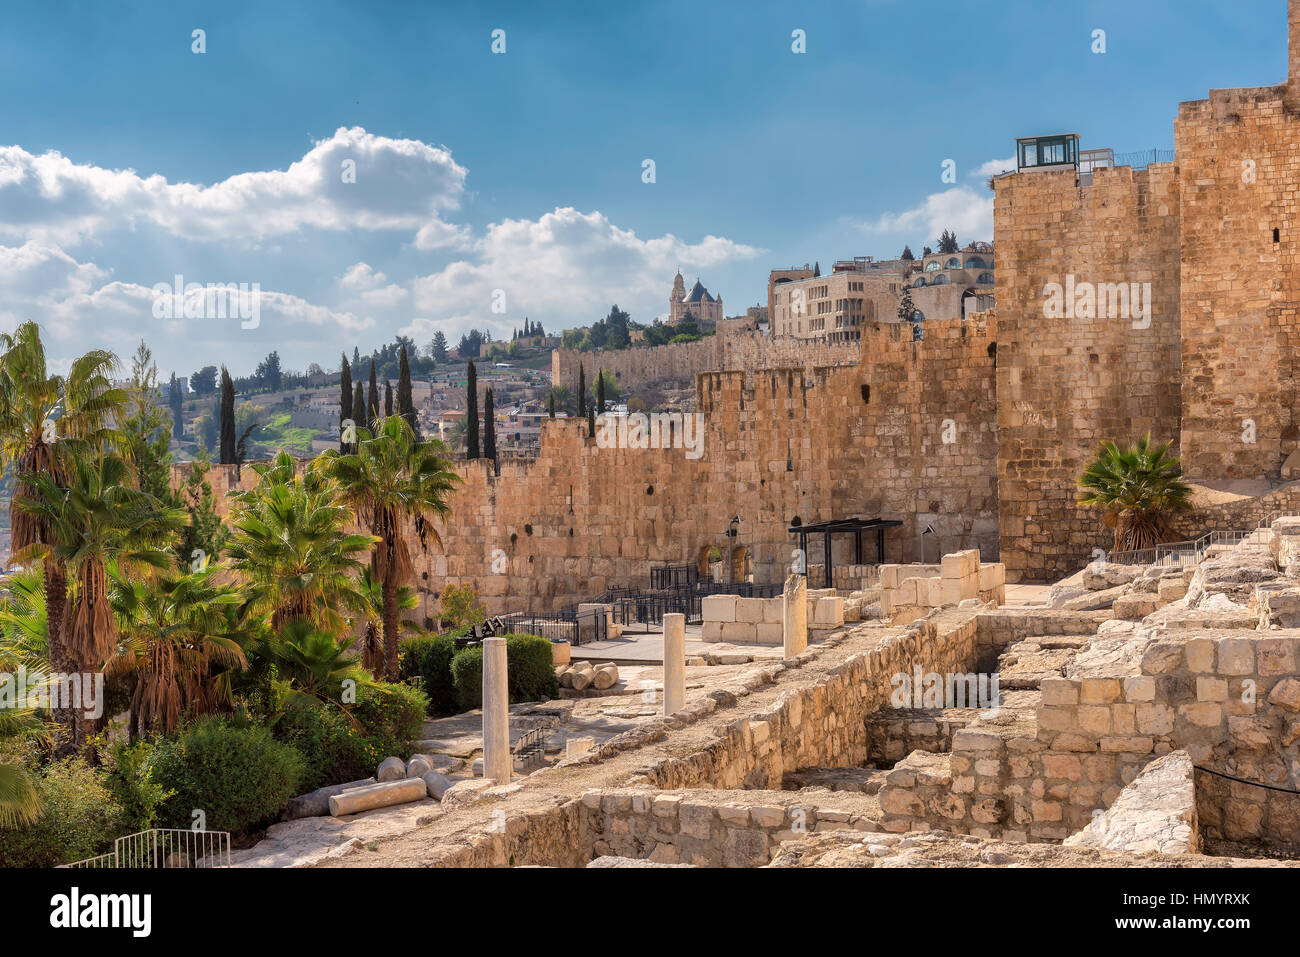 Una vista di antica Gerusalemme vecchia città dal Monte del Tempio, Gerusalemme, Israele. Immagini Stock